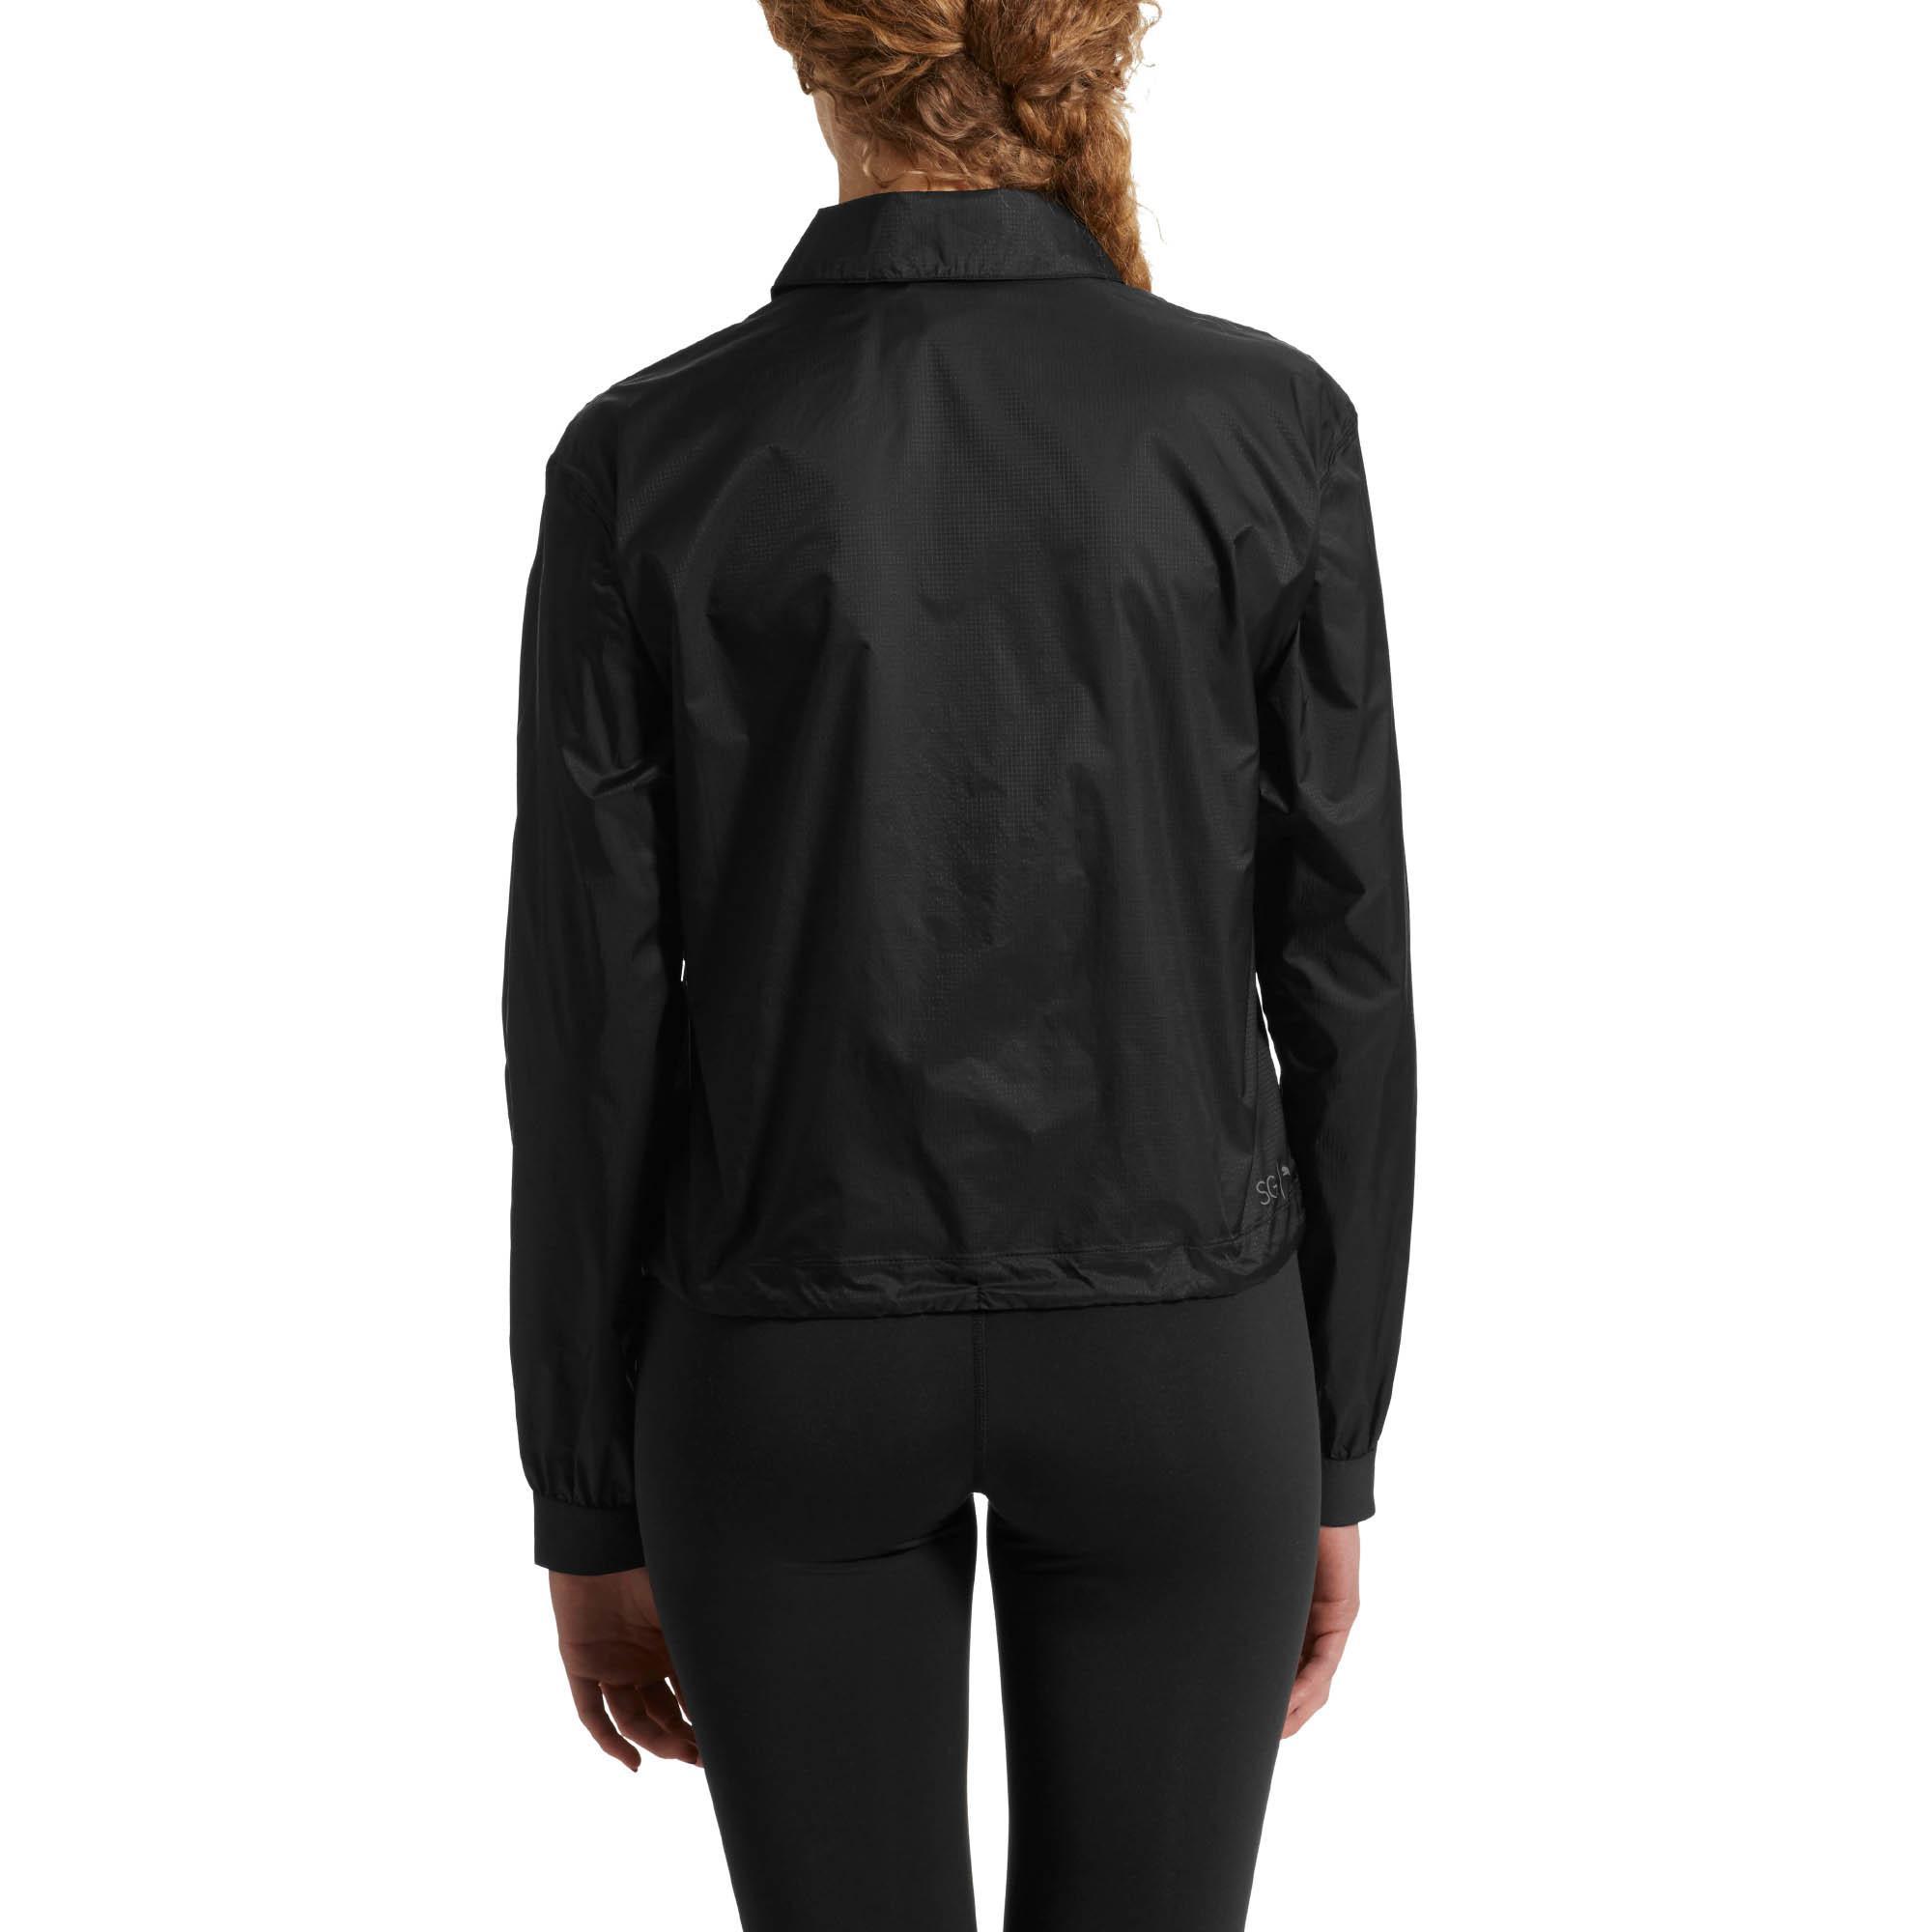 0113c8e009 Lyst - PUMA X Sg Coaches Jacket in Black